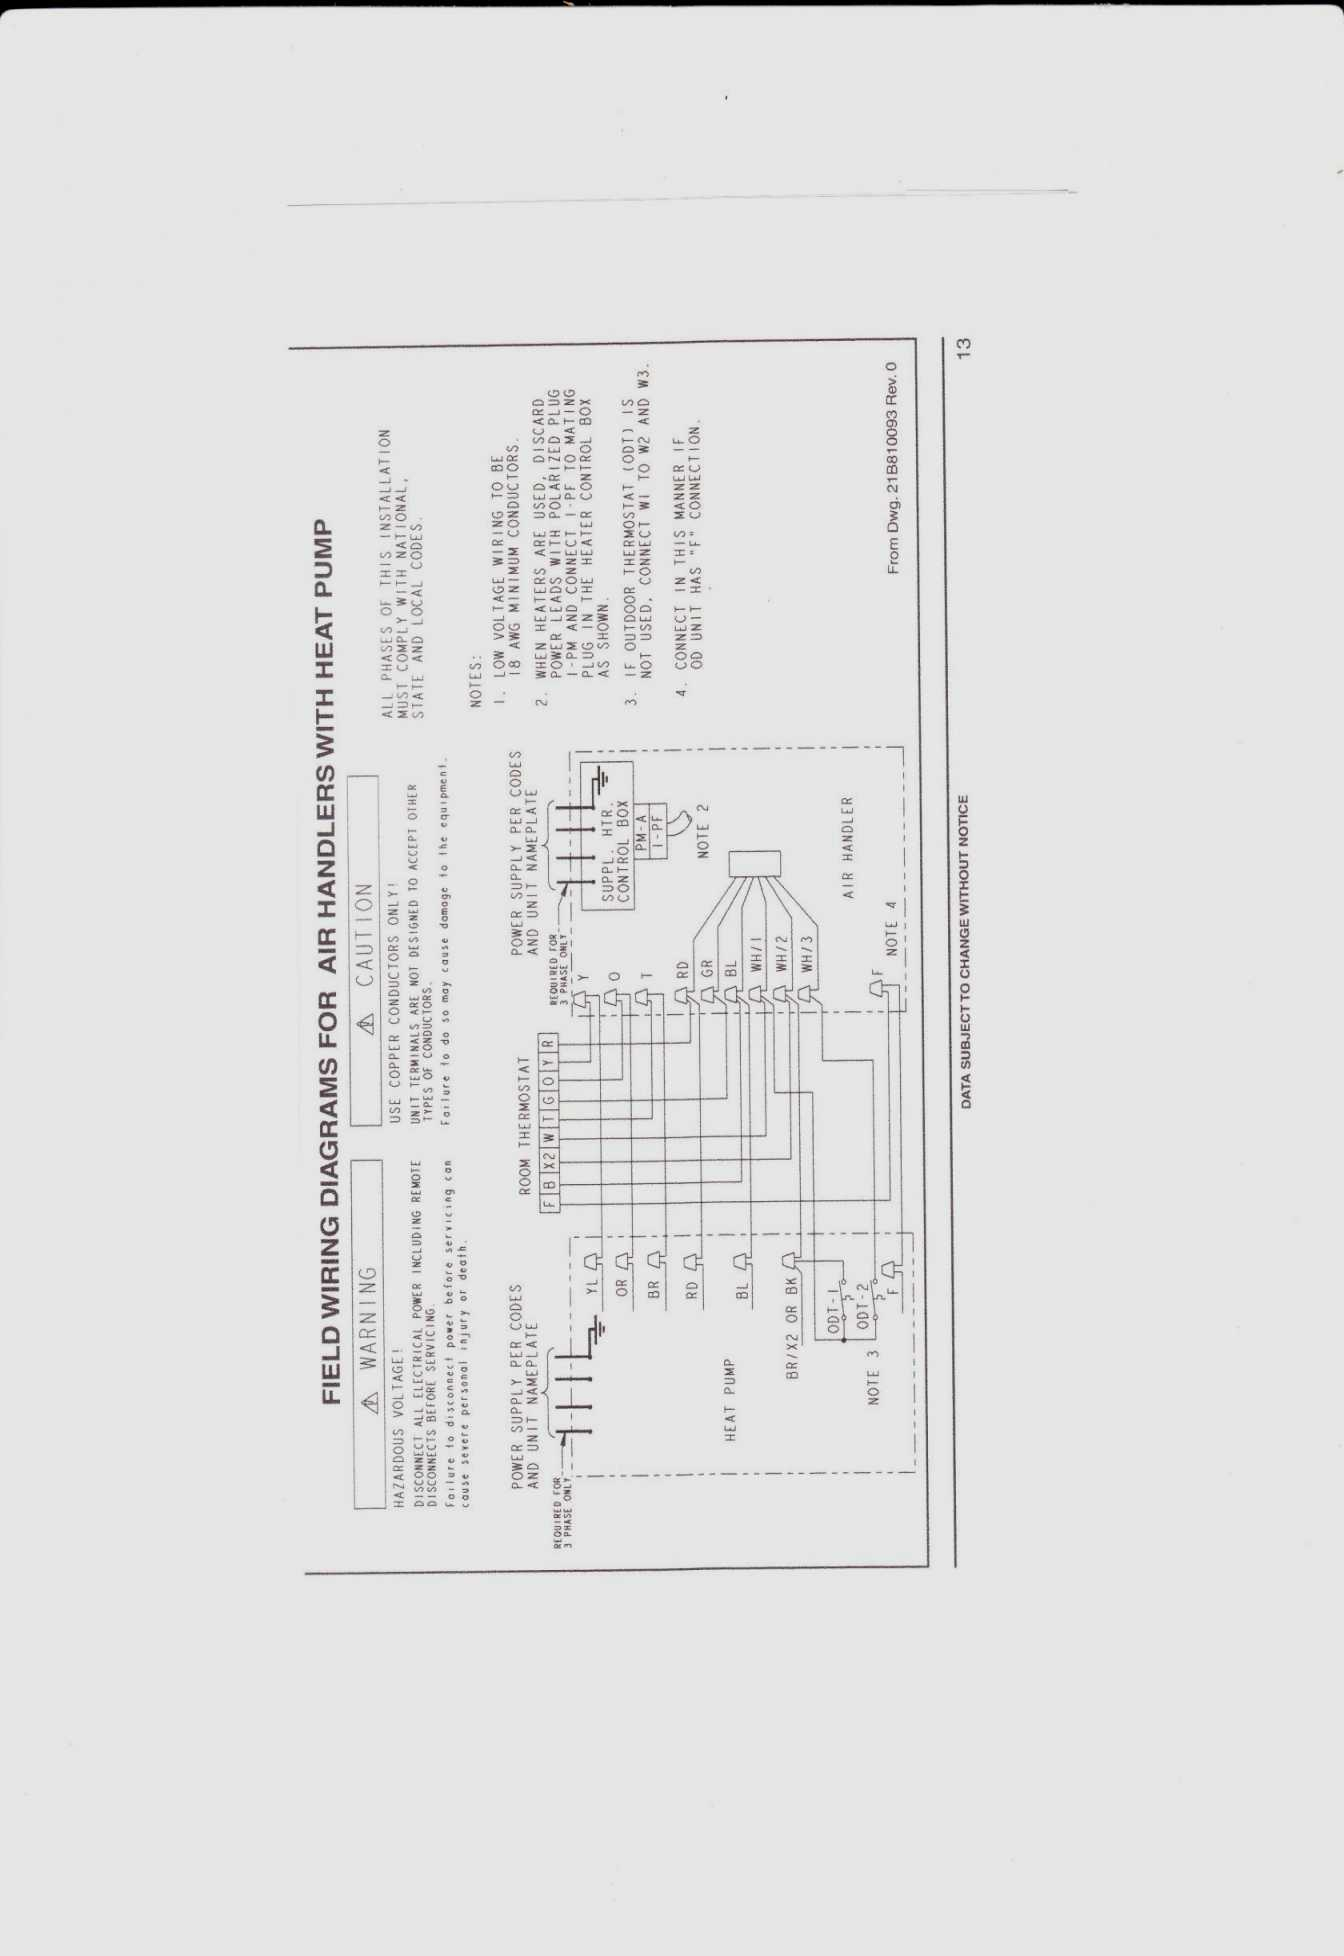 Nema 6 20R Twist Lock Wiring Diagram | Wiring Diagram - Nema 6-20R Wiring Diagram